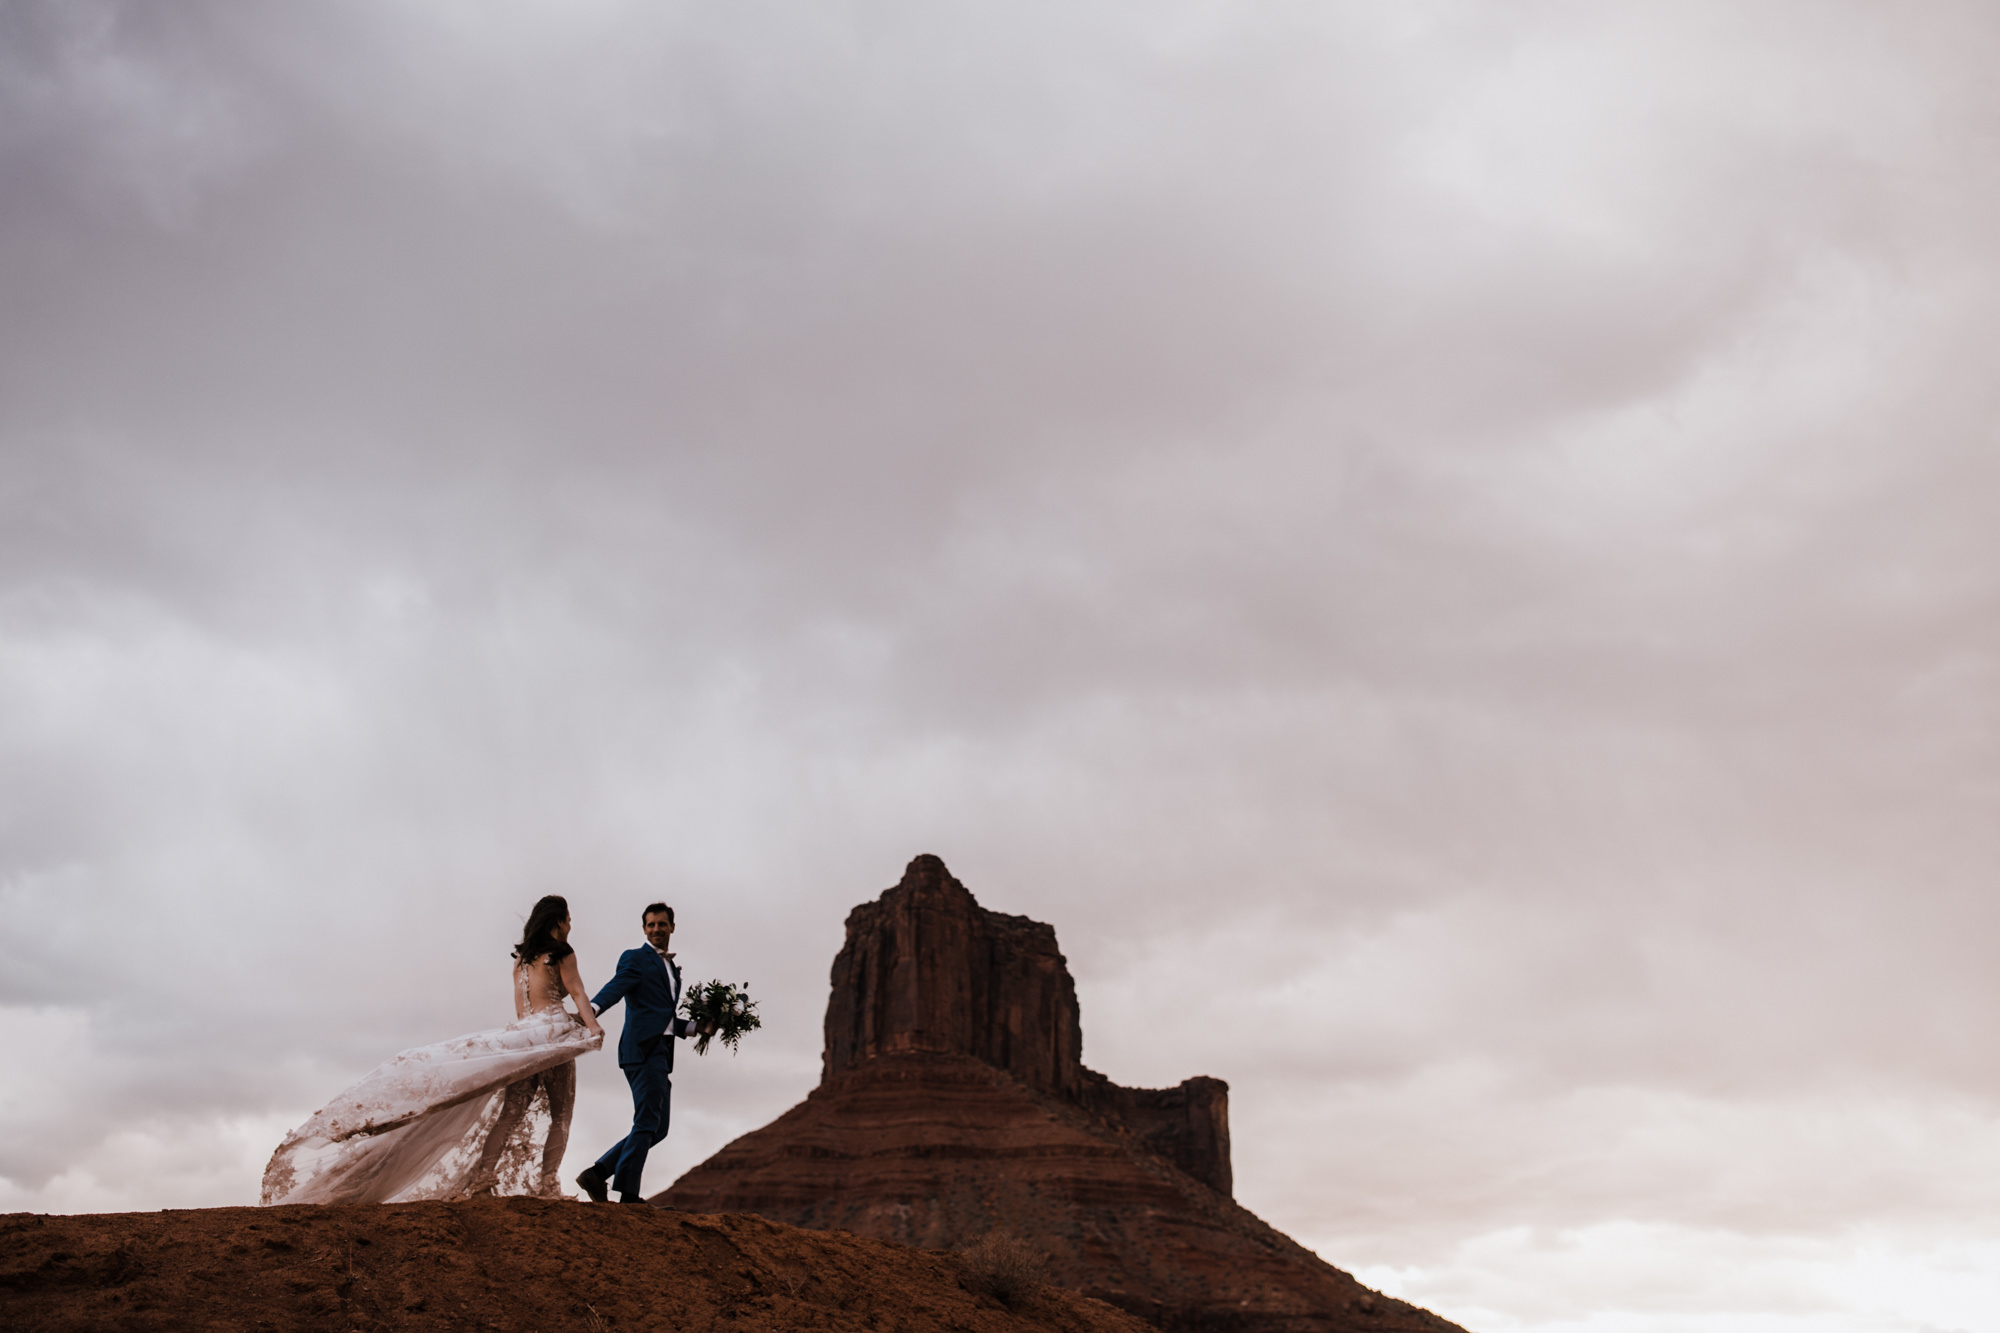 hiking elopement in moab, utah | destination adventure wedding photographers | the hearnes adventure photography | www.thehearnes.com